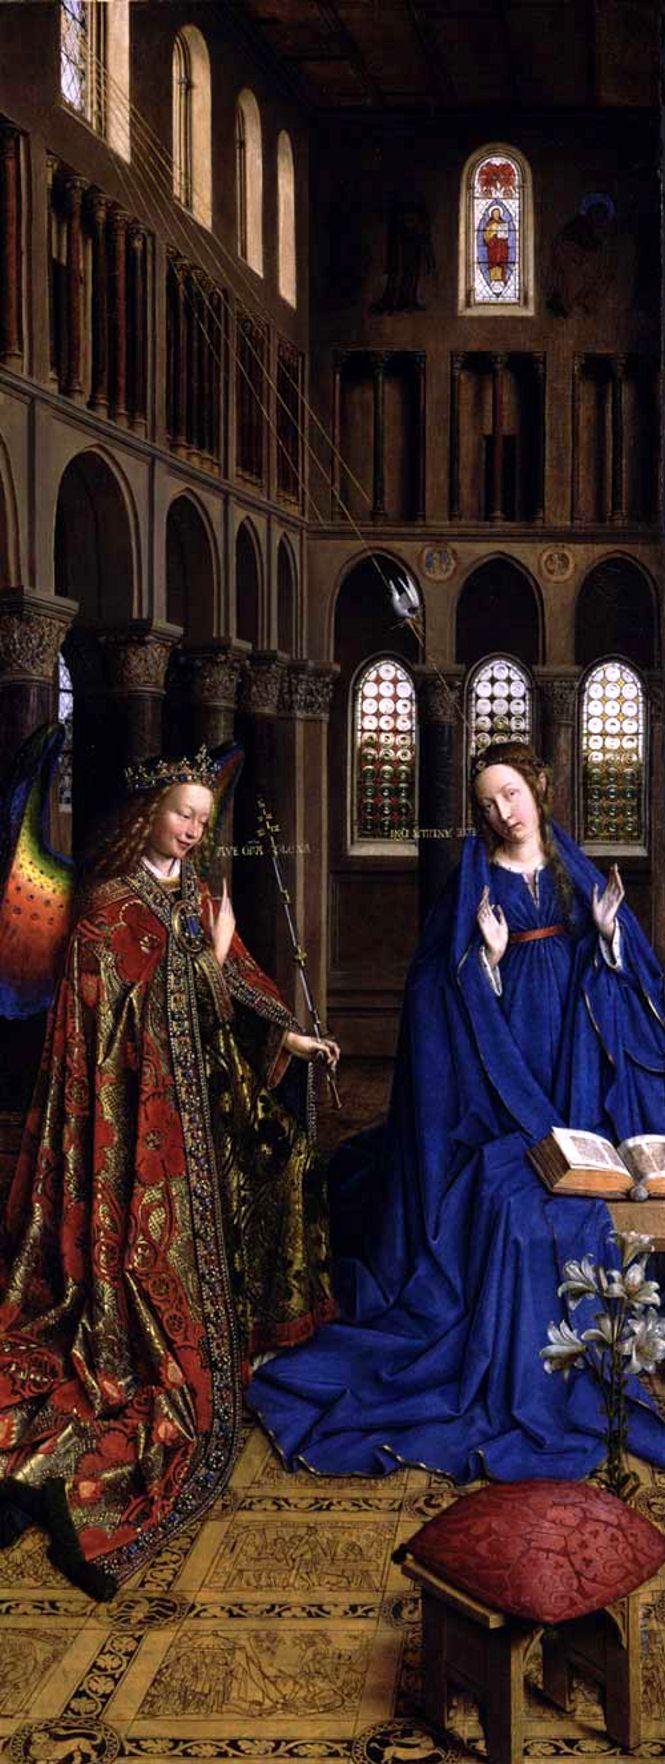 Annunciation by Jan Van Eyck, 1434